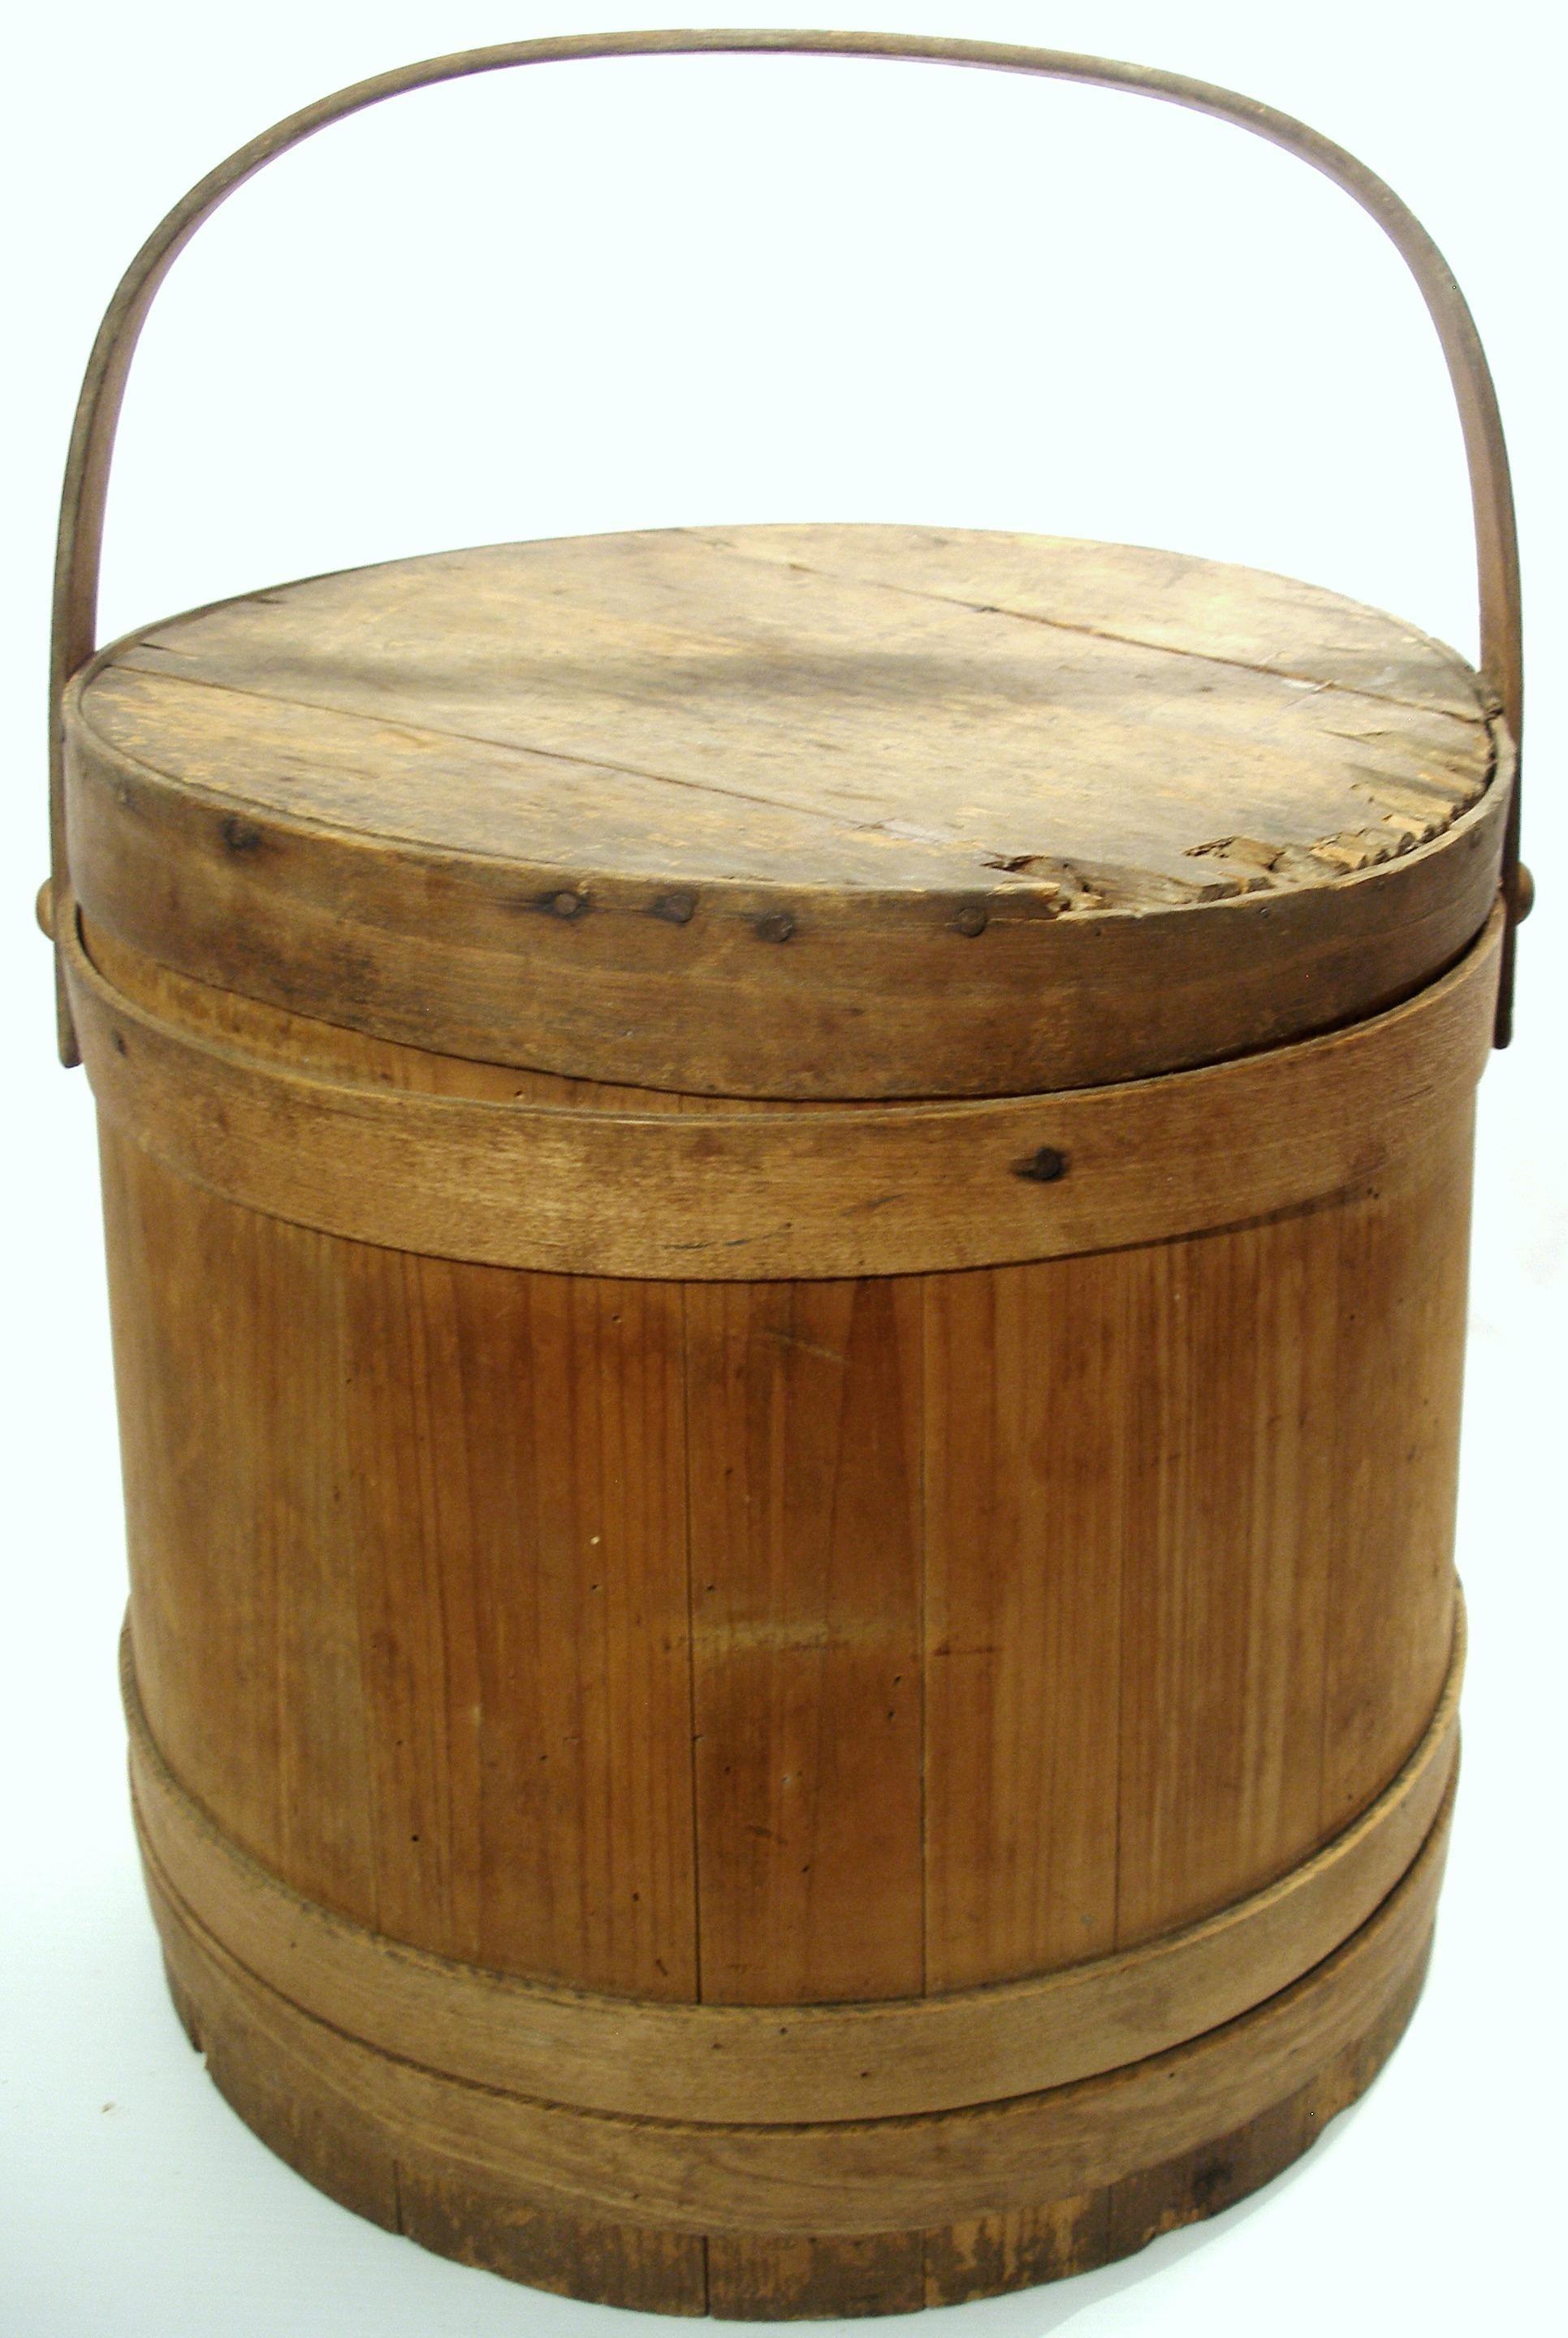 Antique Bent Wood Banded Oak Slat Sugar Firkin Barrel Bucket With Lid In 2020 Bent Wood Antiques Wood Furniture Design